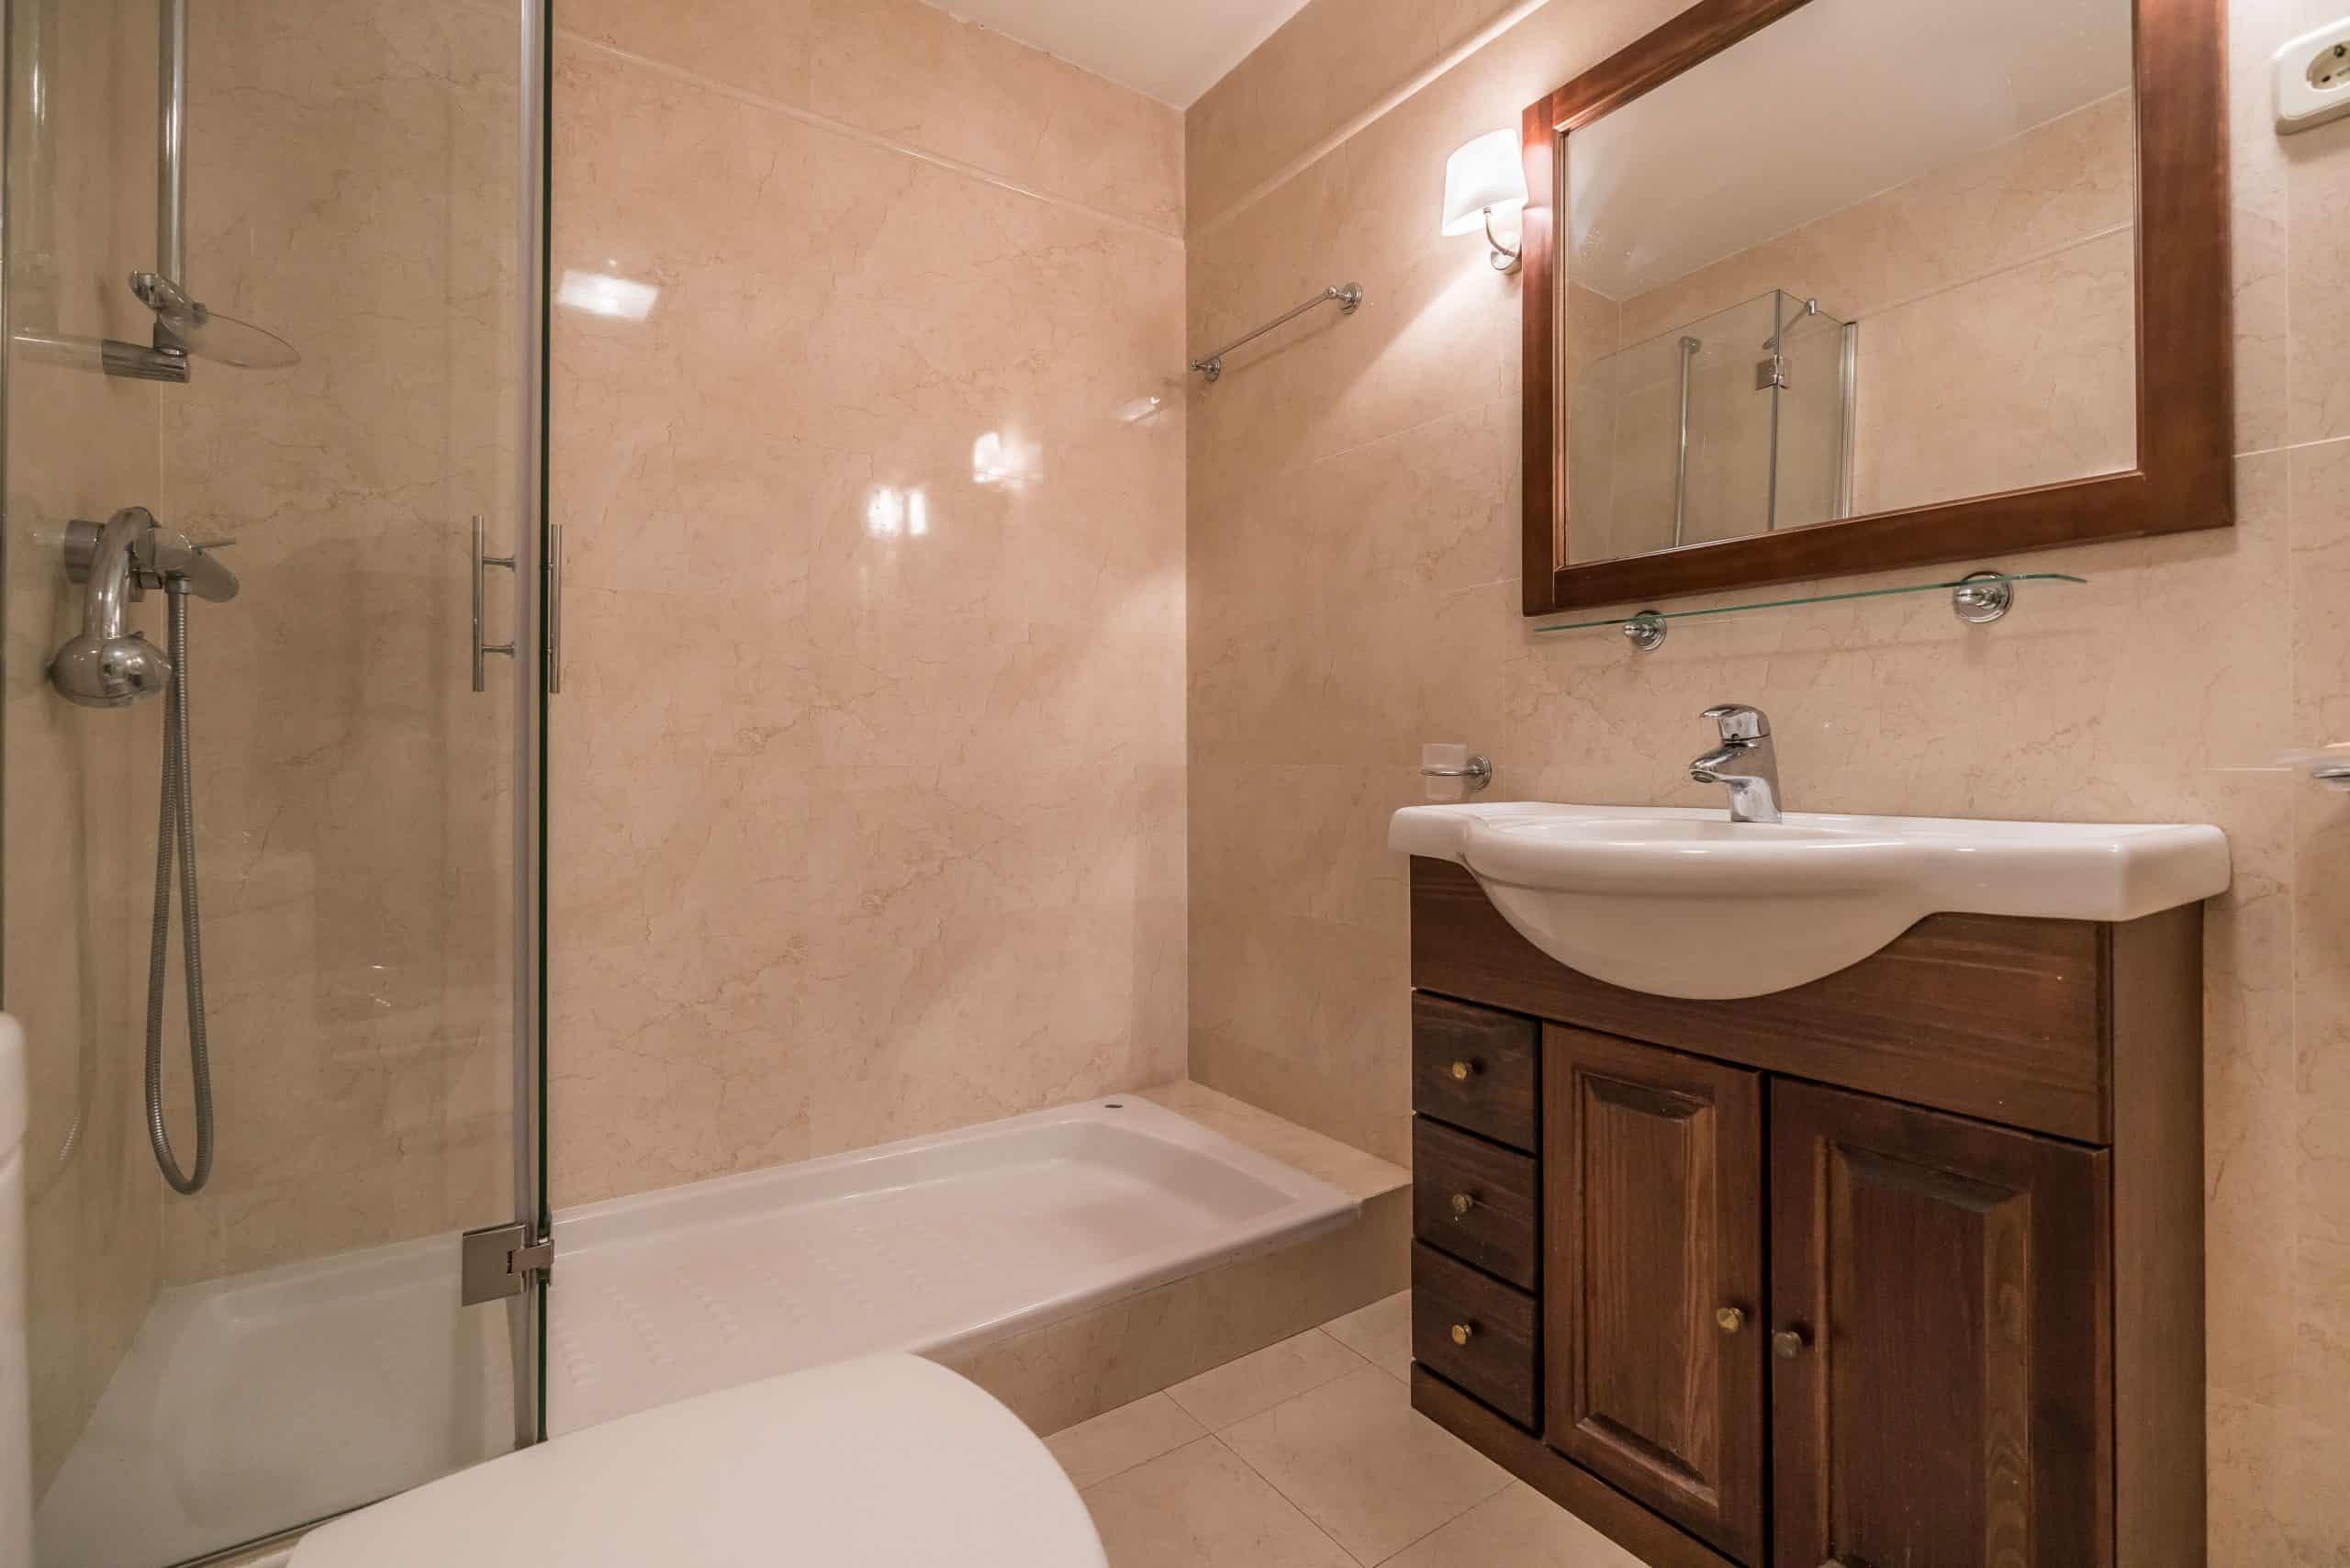 Agencia Inmobiliaria de Madrid-FUTUROCASA-Zona ARGANZUELA-EMBAJADORES-LEGAZPI -calle Embajadores- baño 20